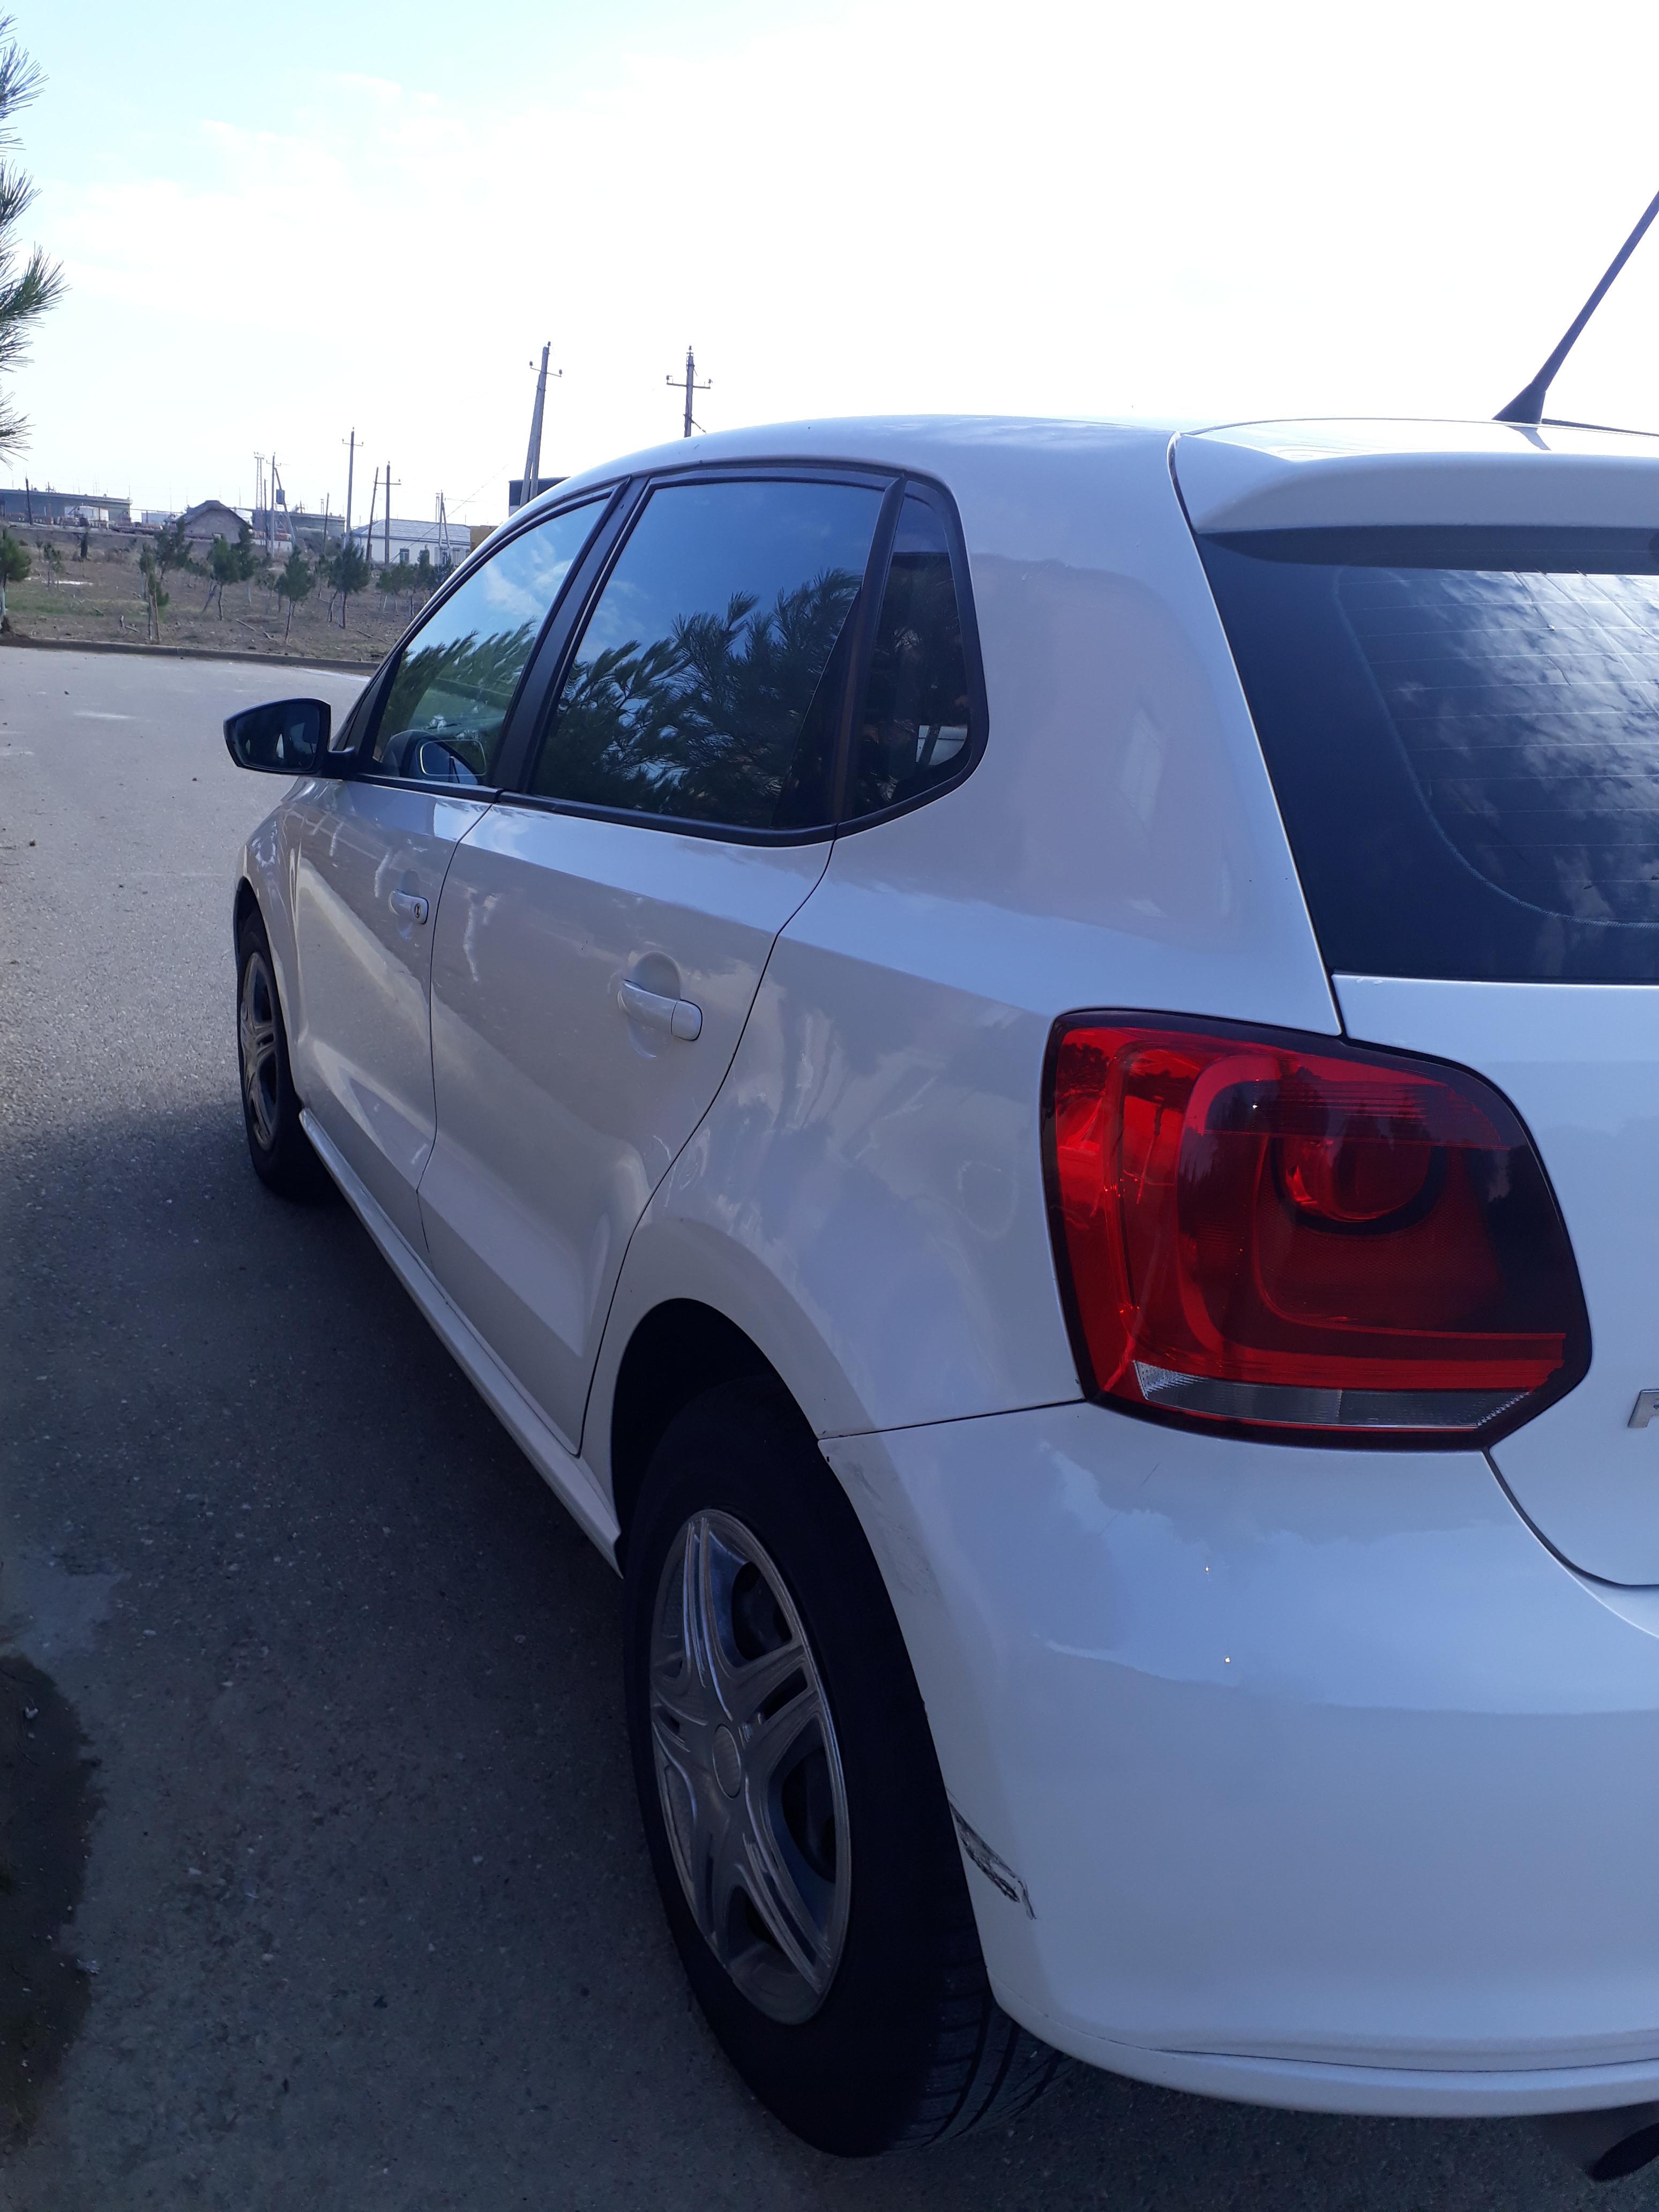 Volkswagen Polo 1.4(lt) 2010 Подержанный  $10700